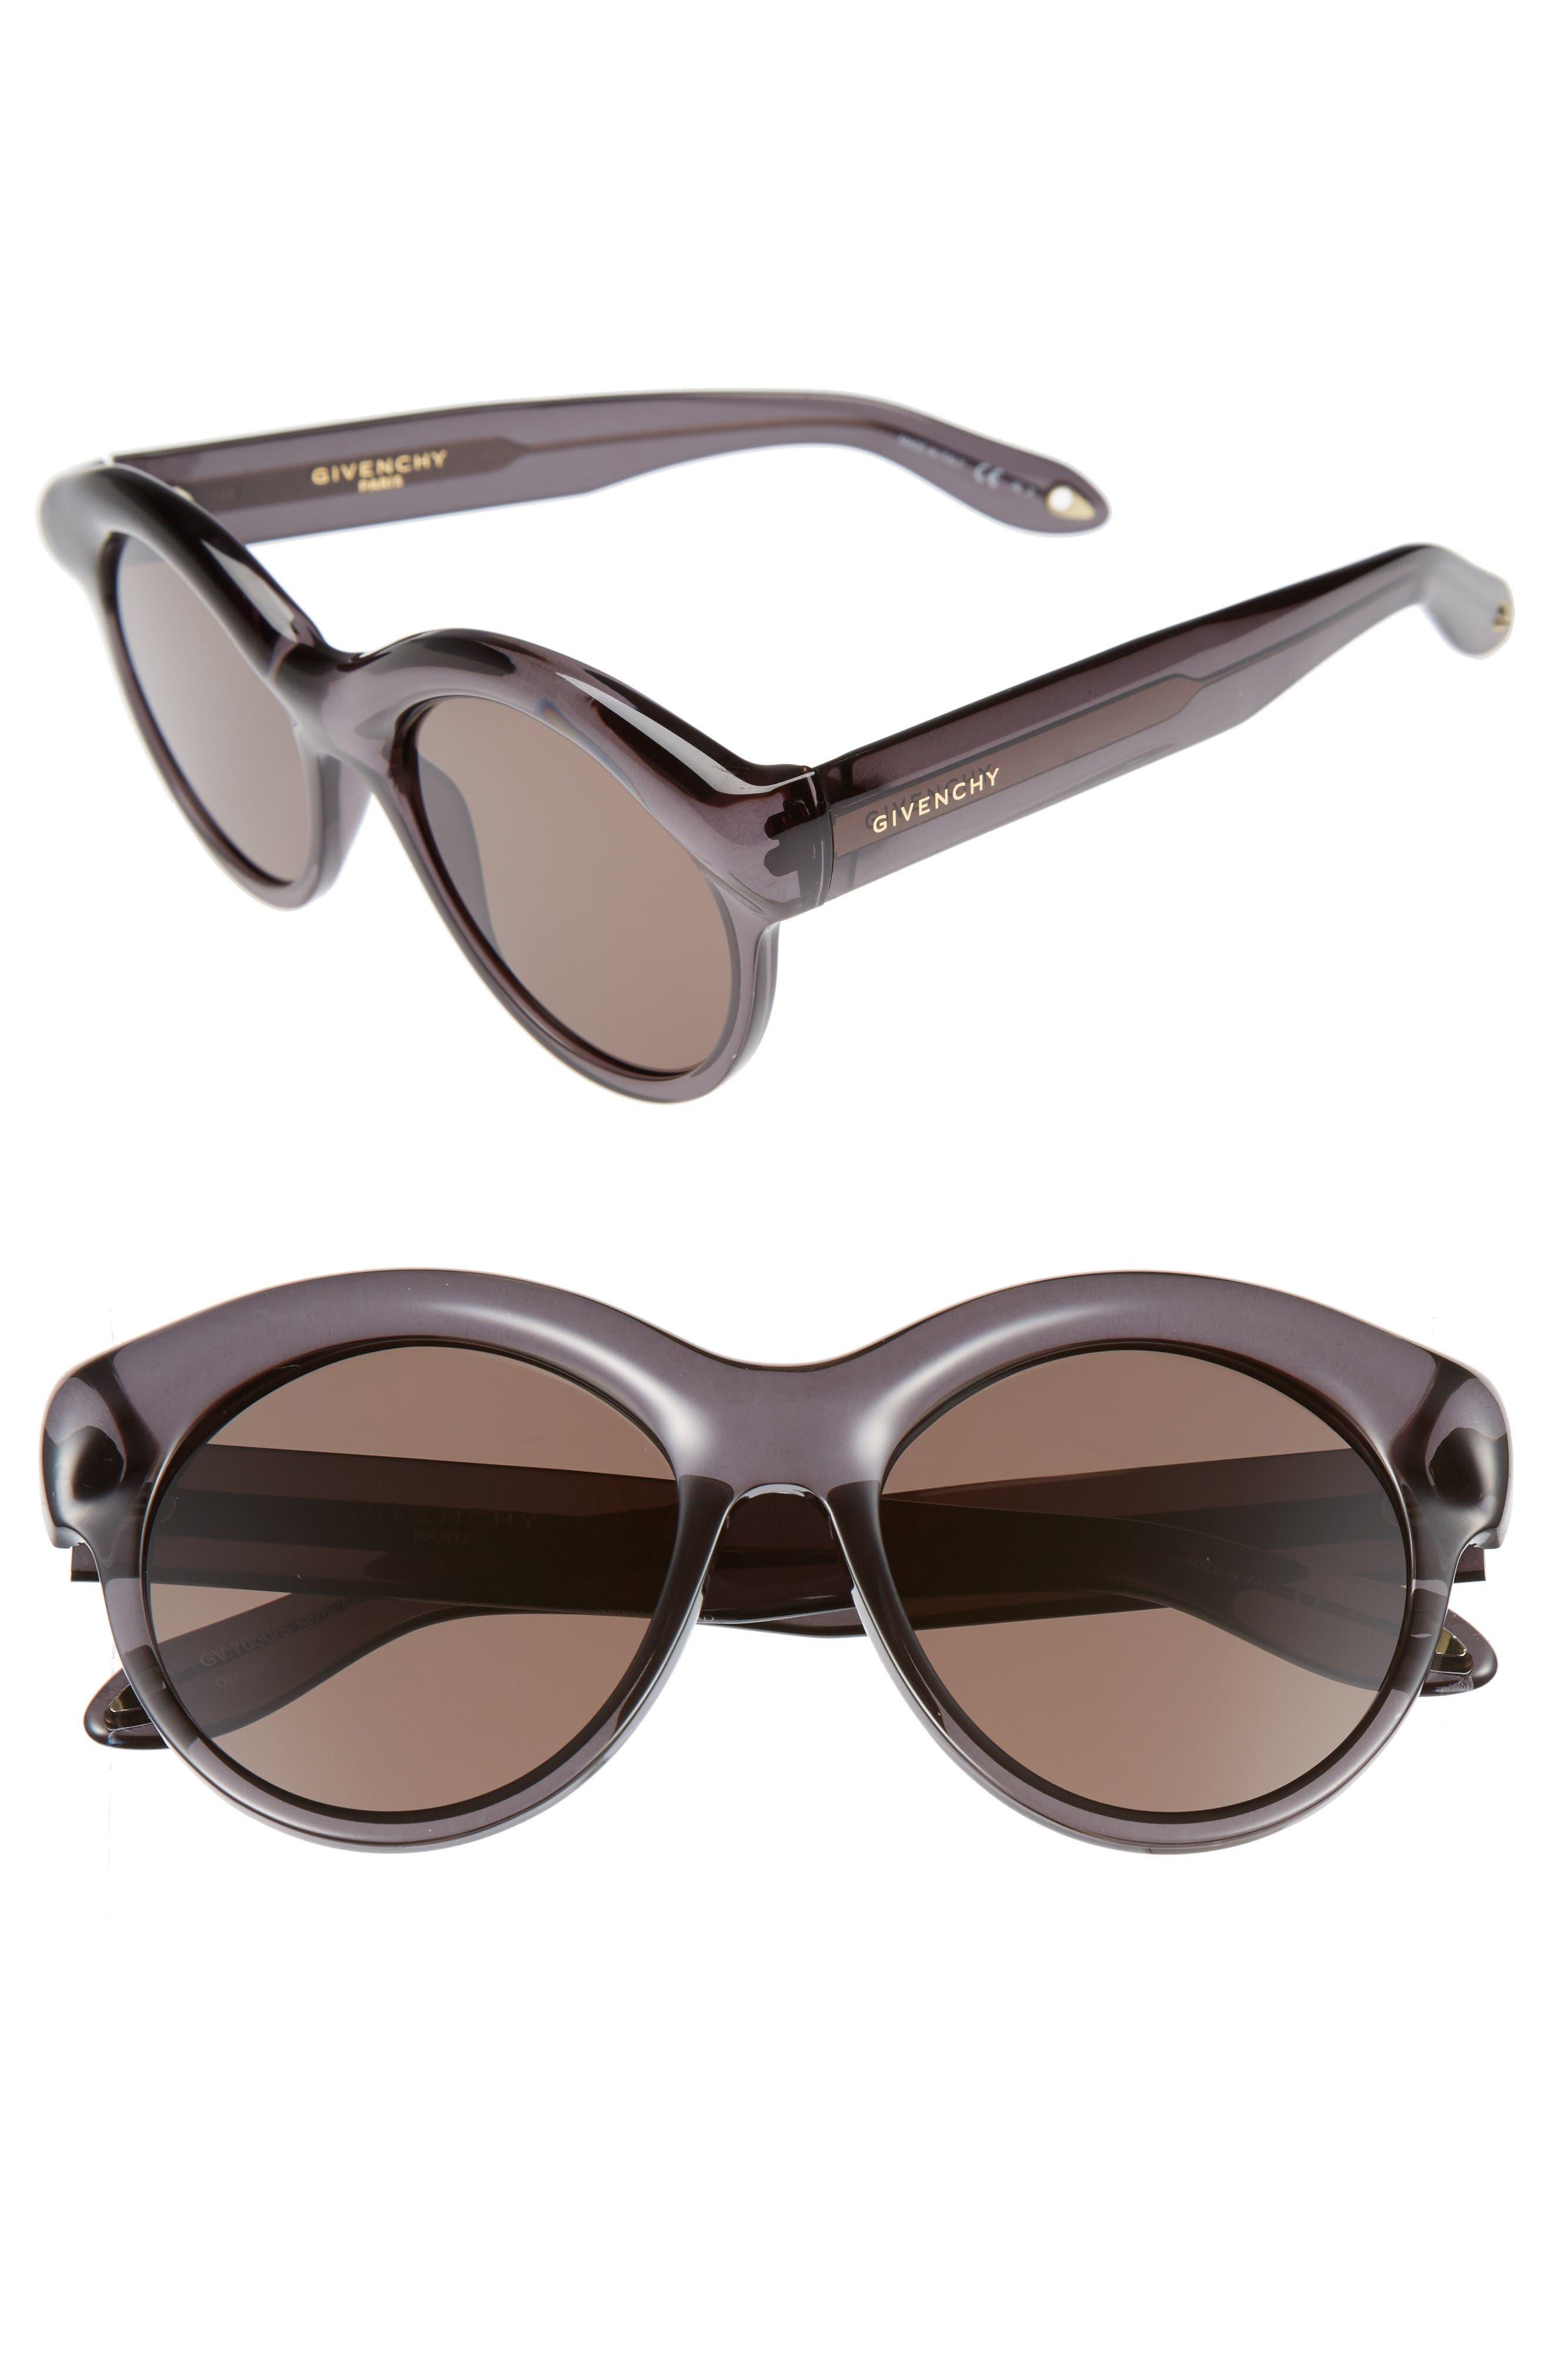 54mm Sunglasses,                             Main thumbnail 1, color,                             Grey